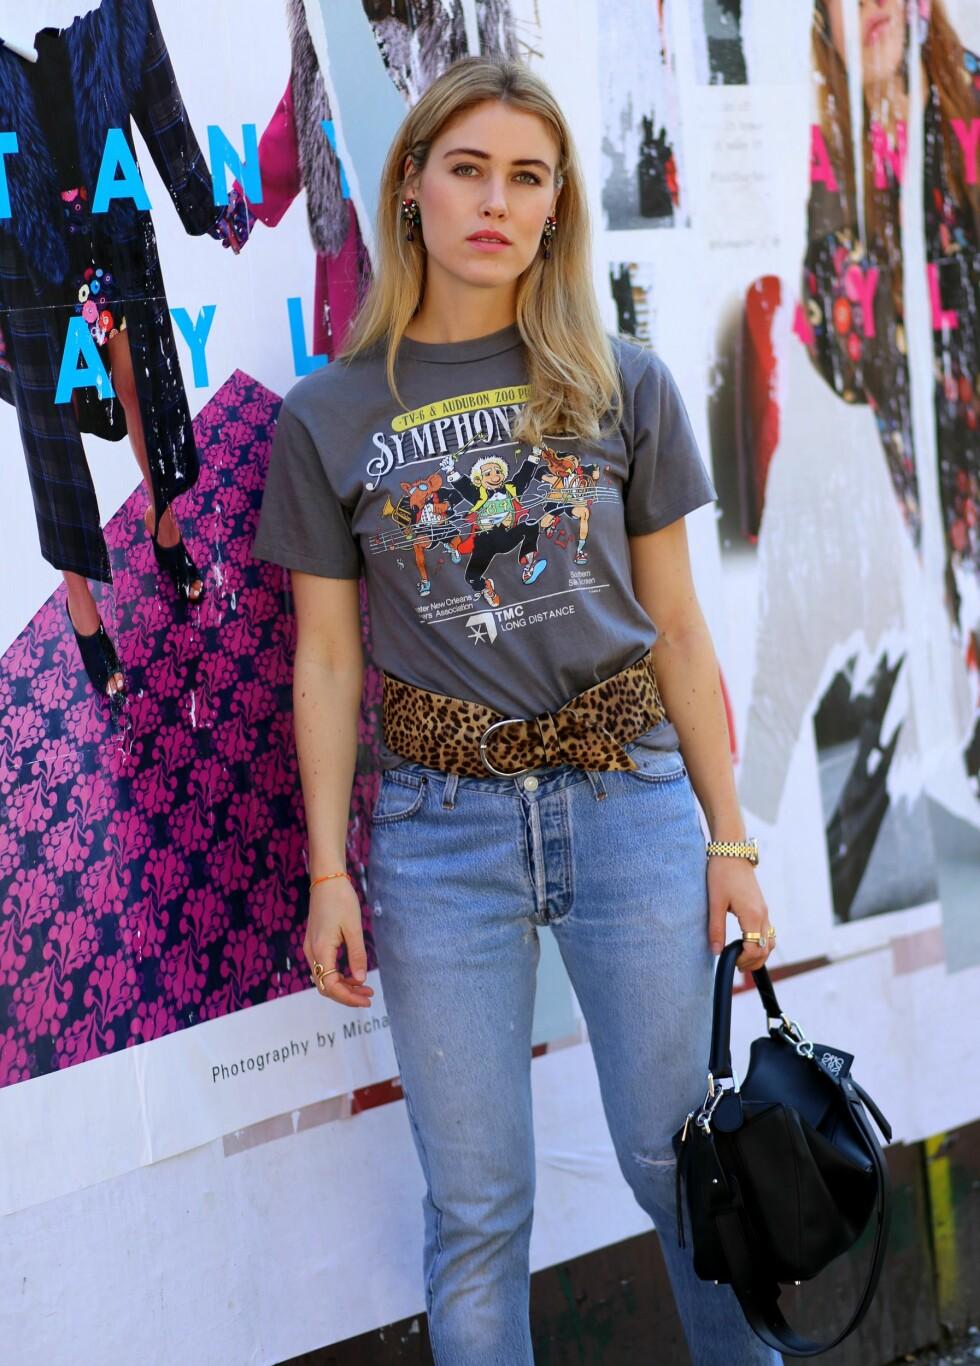 Foto: Annabelrosendahl.com